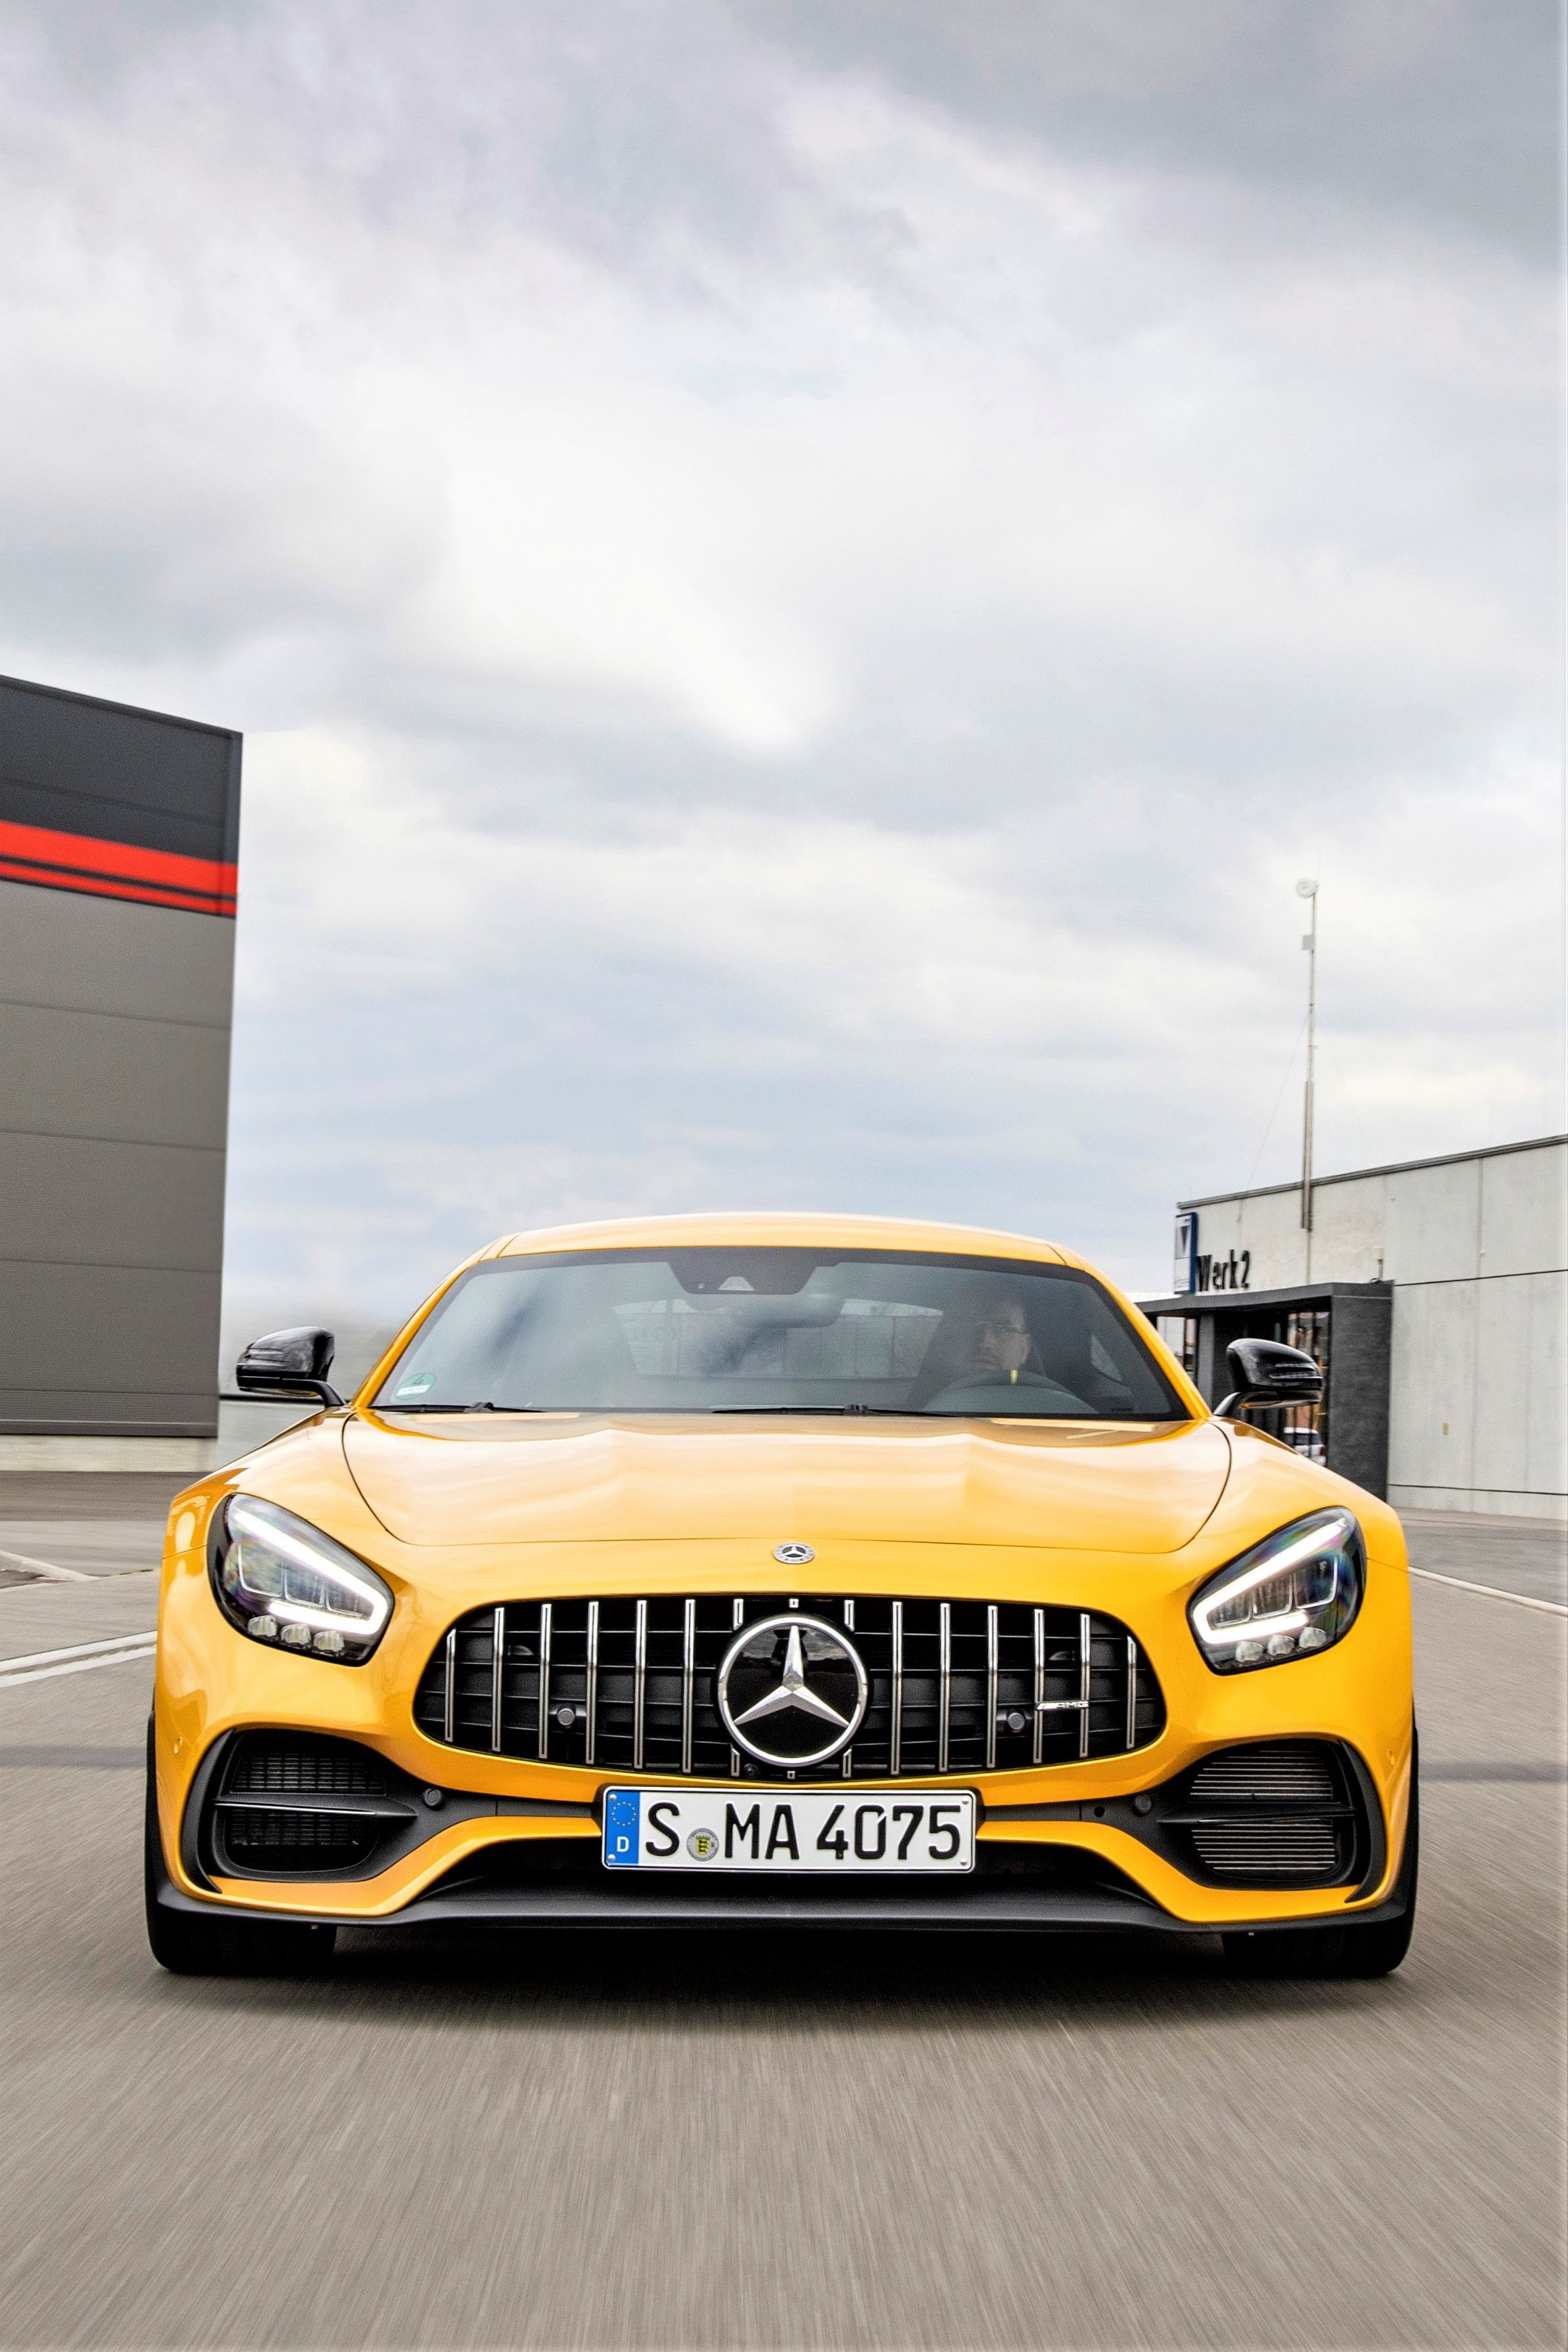 2019 Mercedes-AMG GT S - The MAN #mercedesamg